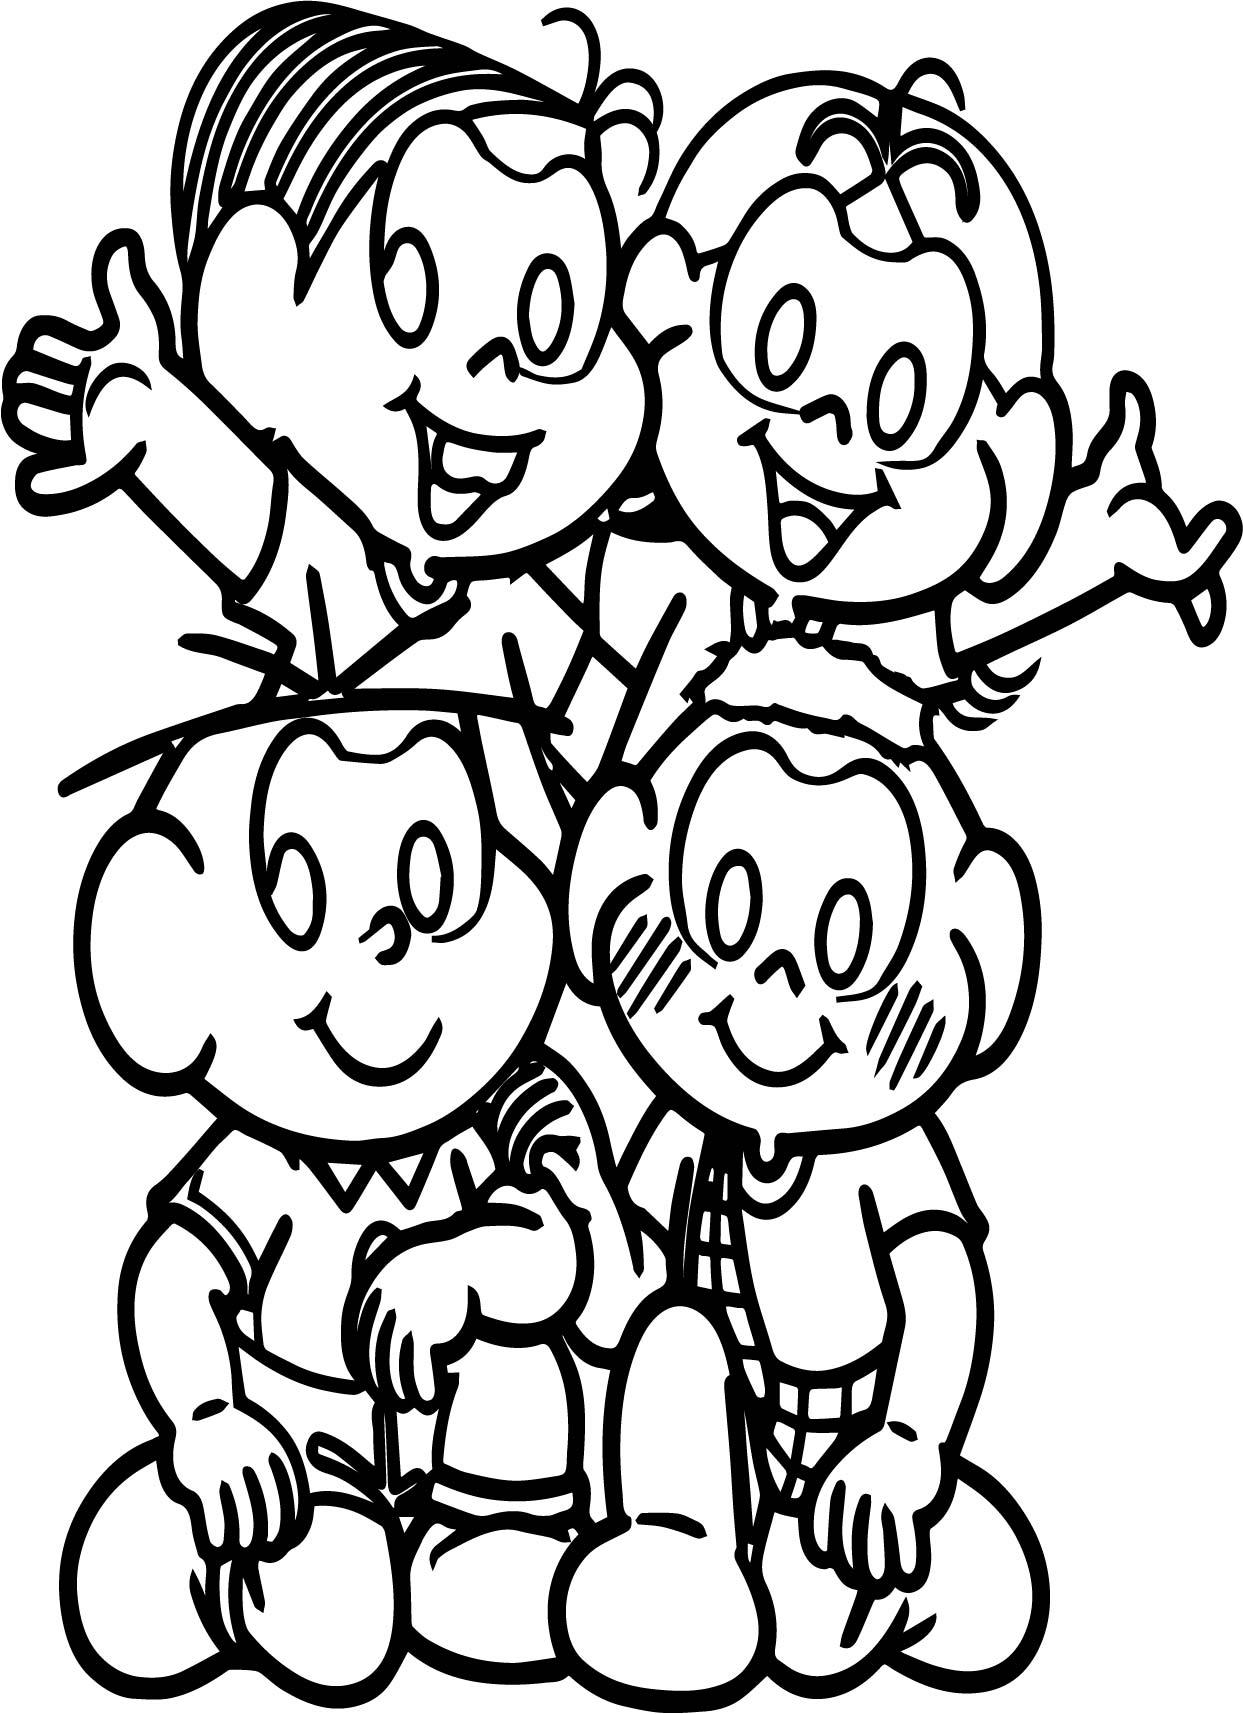 Turma Da Monica Four Kids Coloring Page